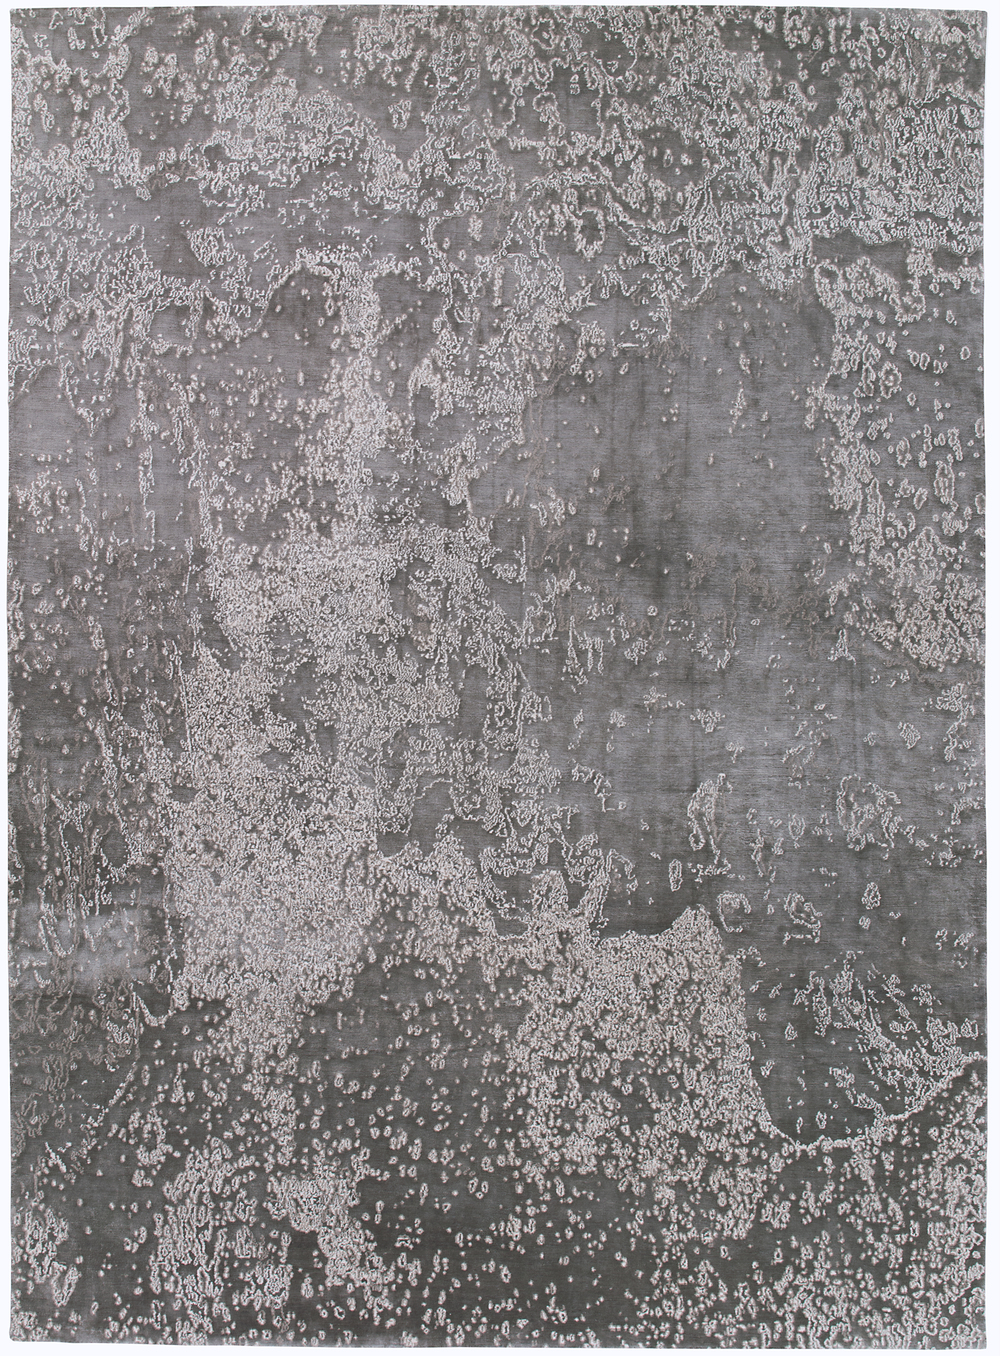 23001_Aquarium_Dark_Silver_T1.jpg